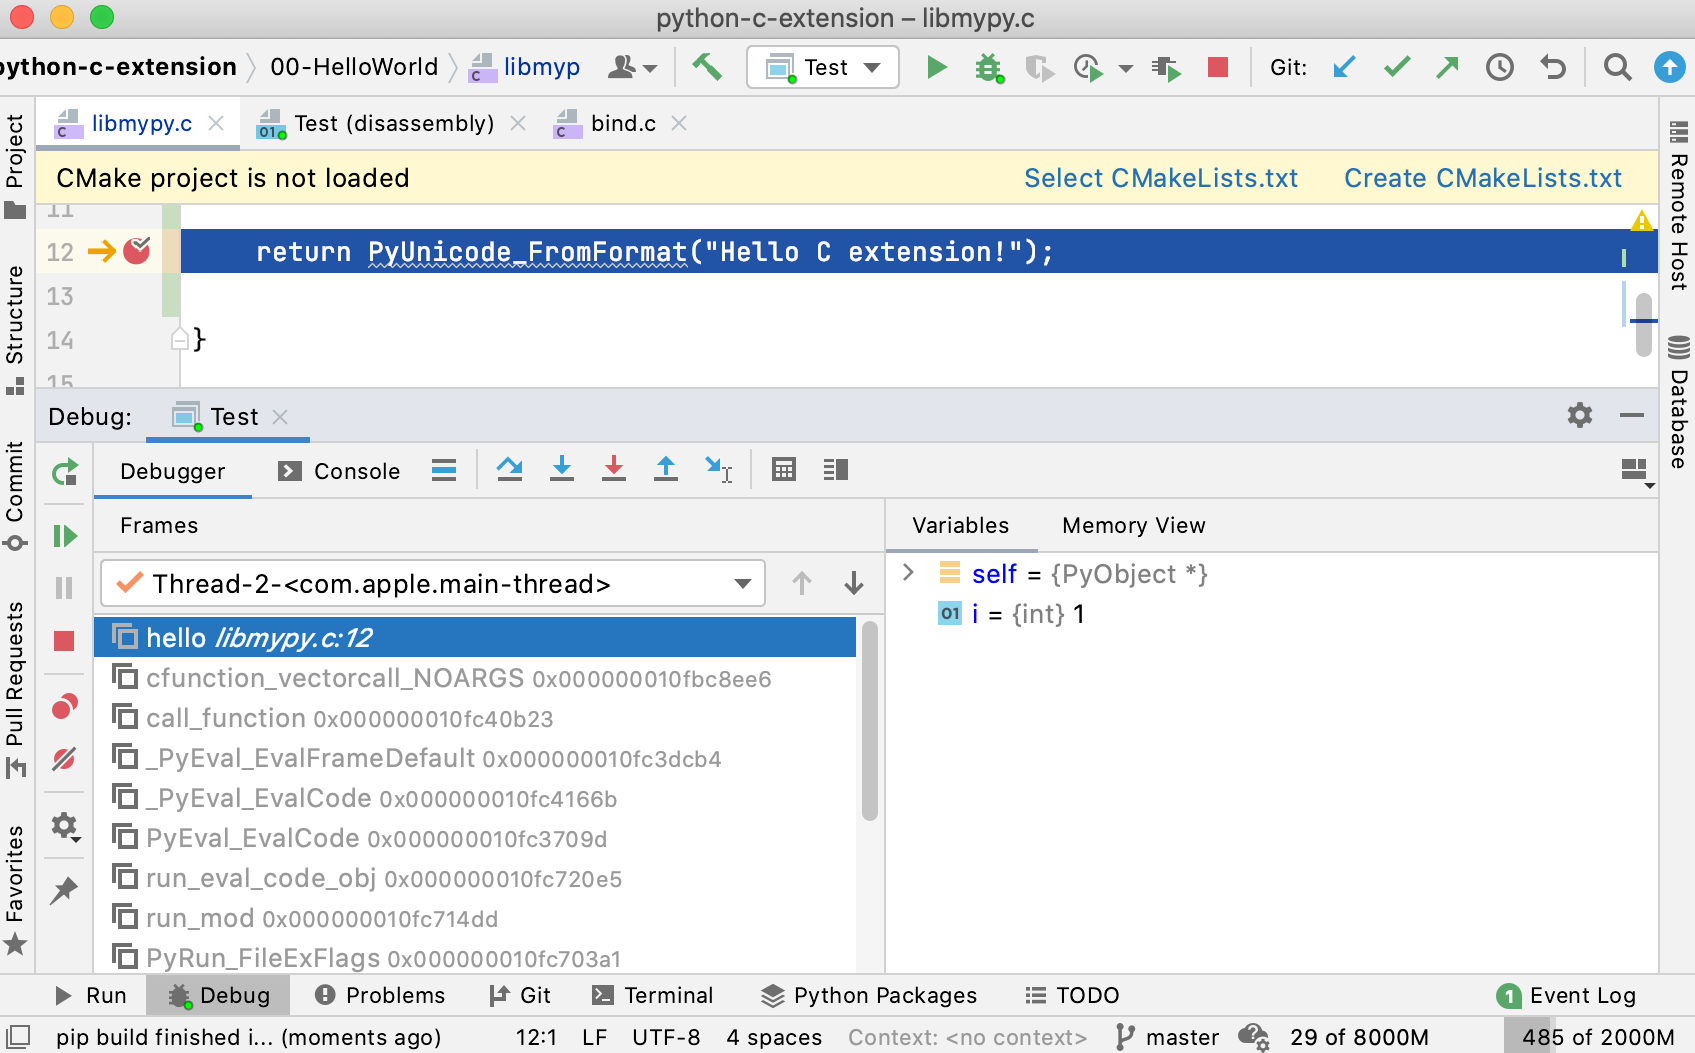 Debugging a Python extension